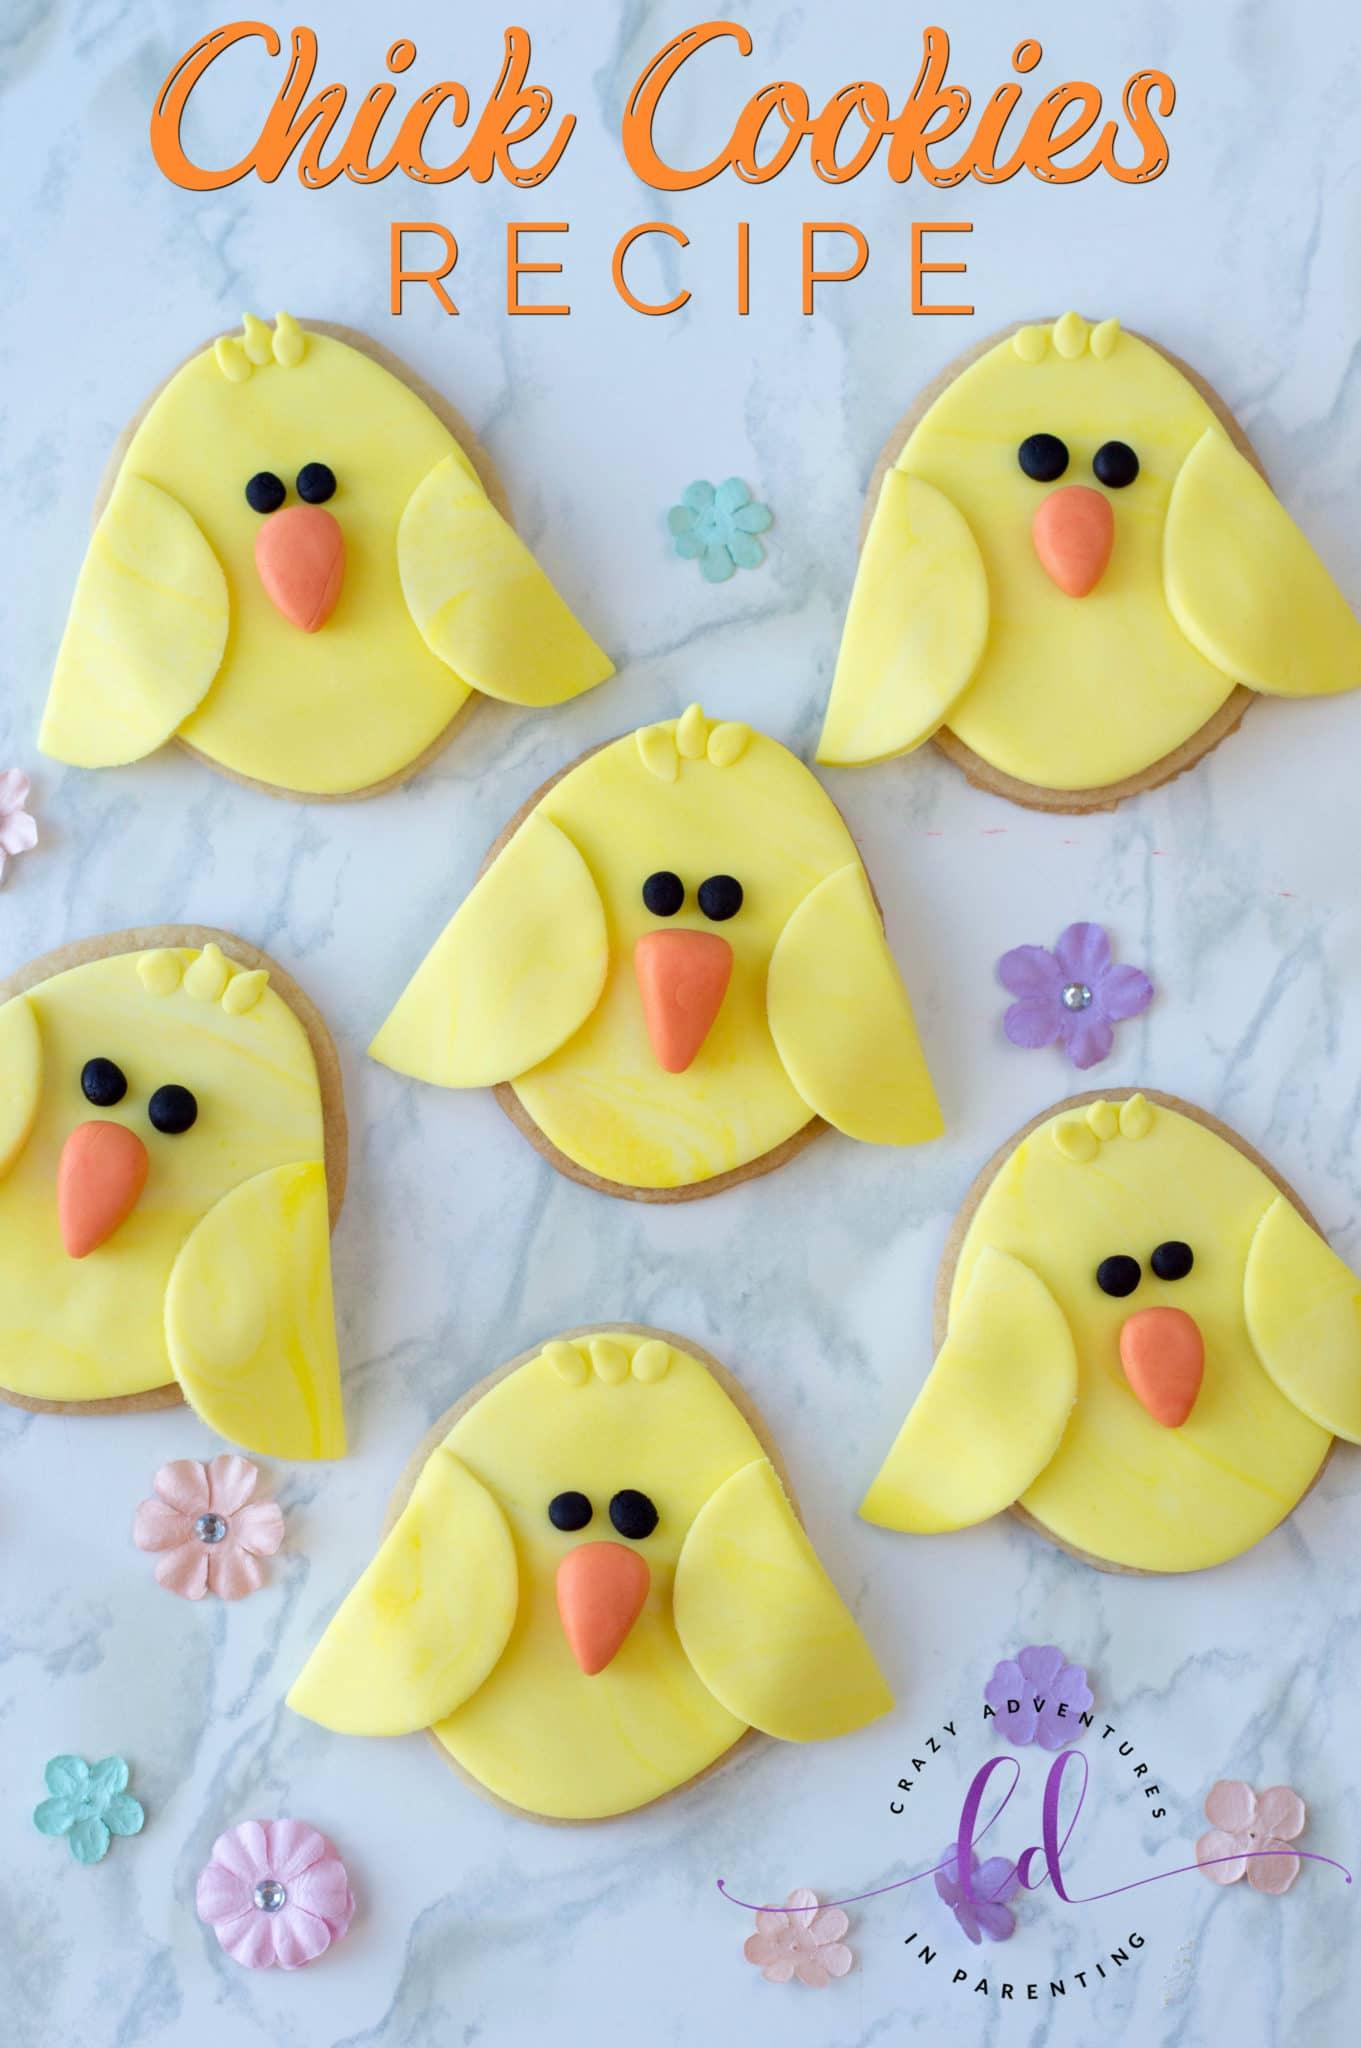 Chick Cookies Recipe